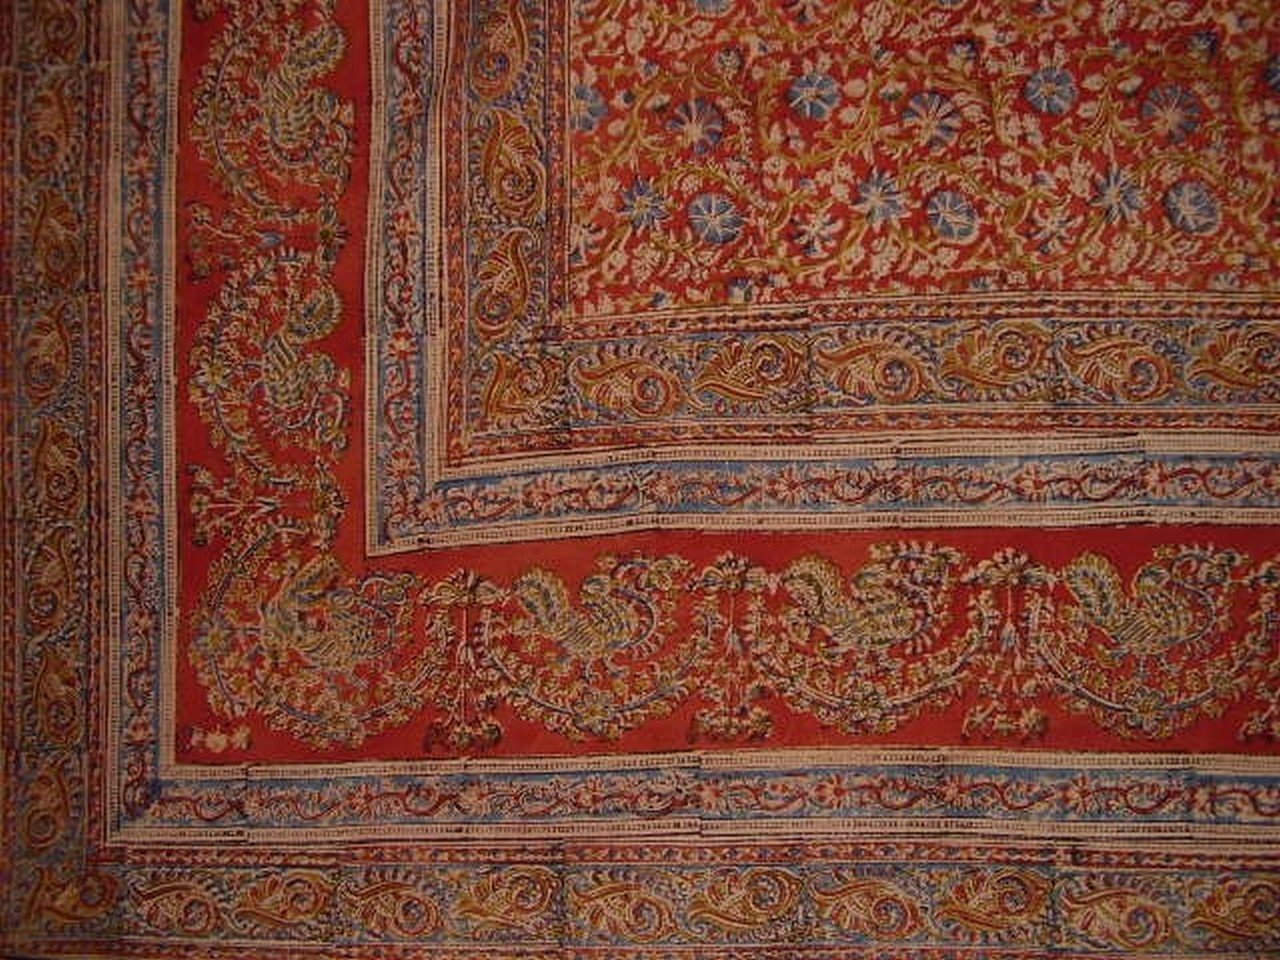 Veggie Dye Block Print Tapestry Cotton Bedspread 108'' x 88'' Full-Queen Red